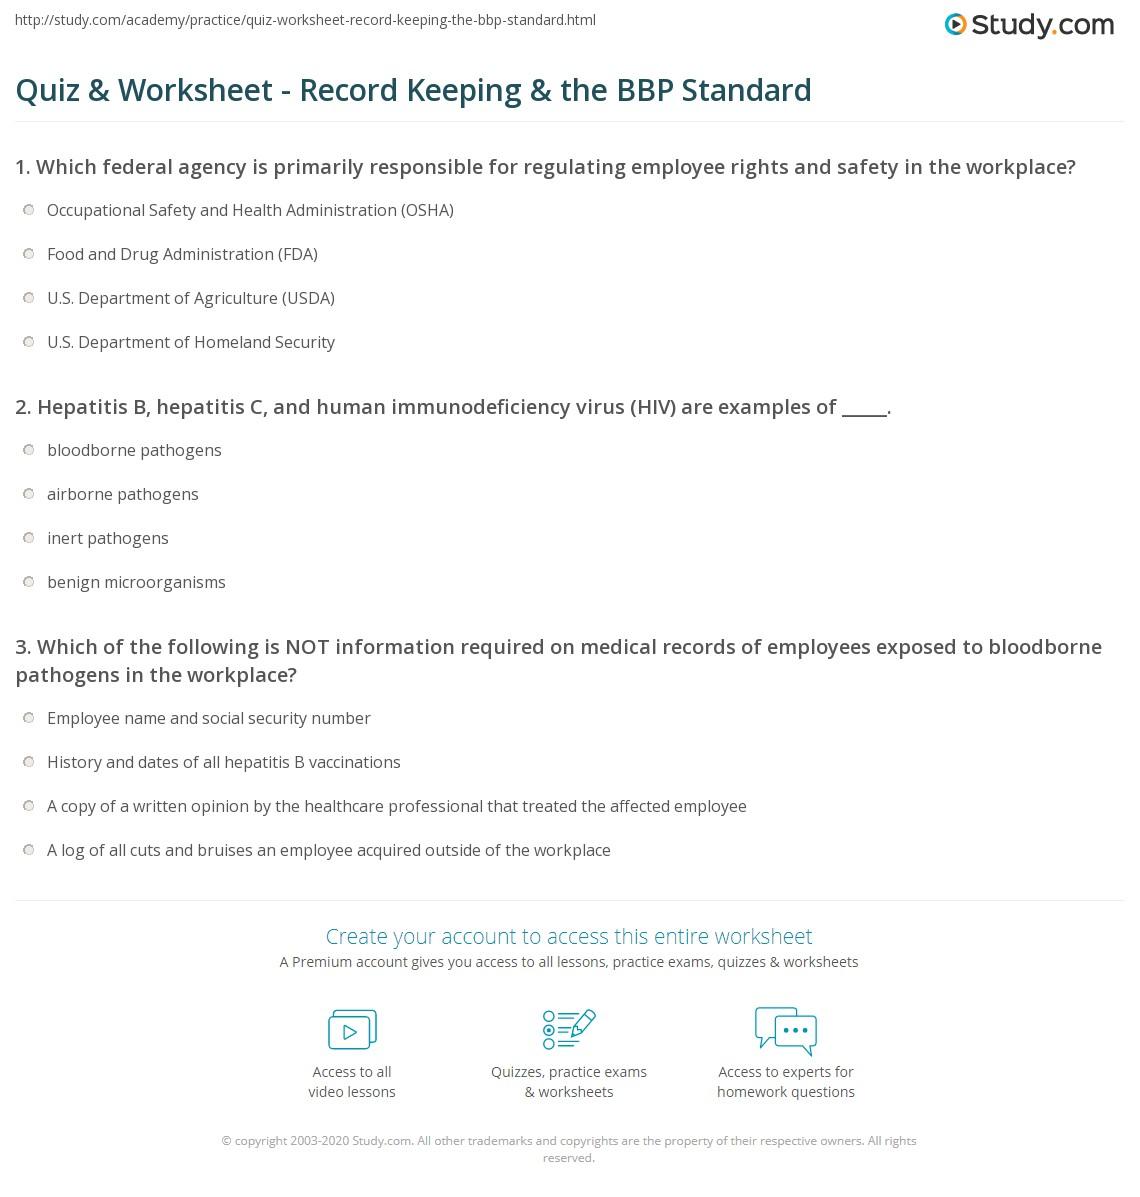 Quiz Worksheet Record Keeping The Bbp Standard Study